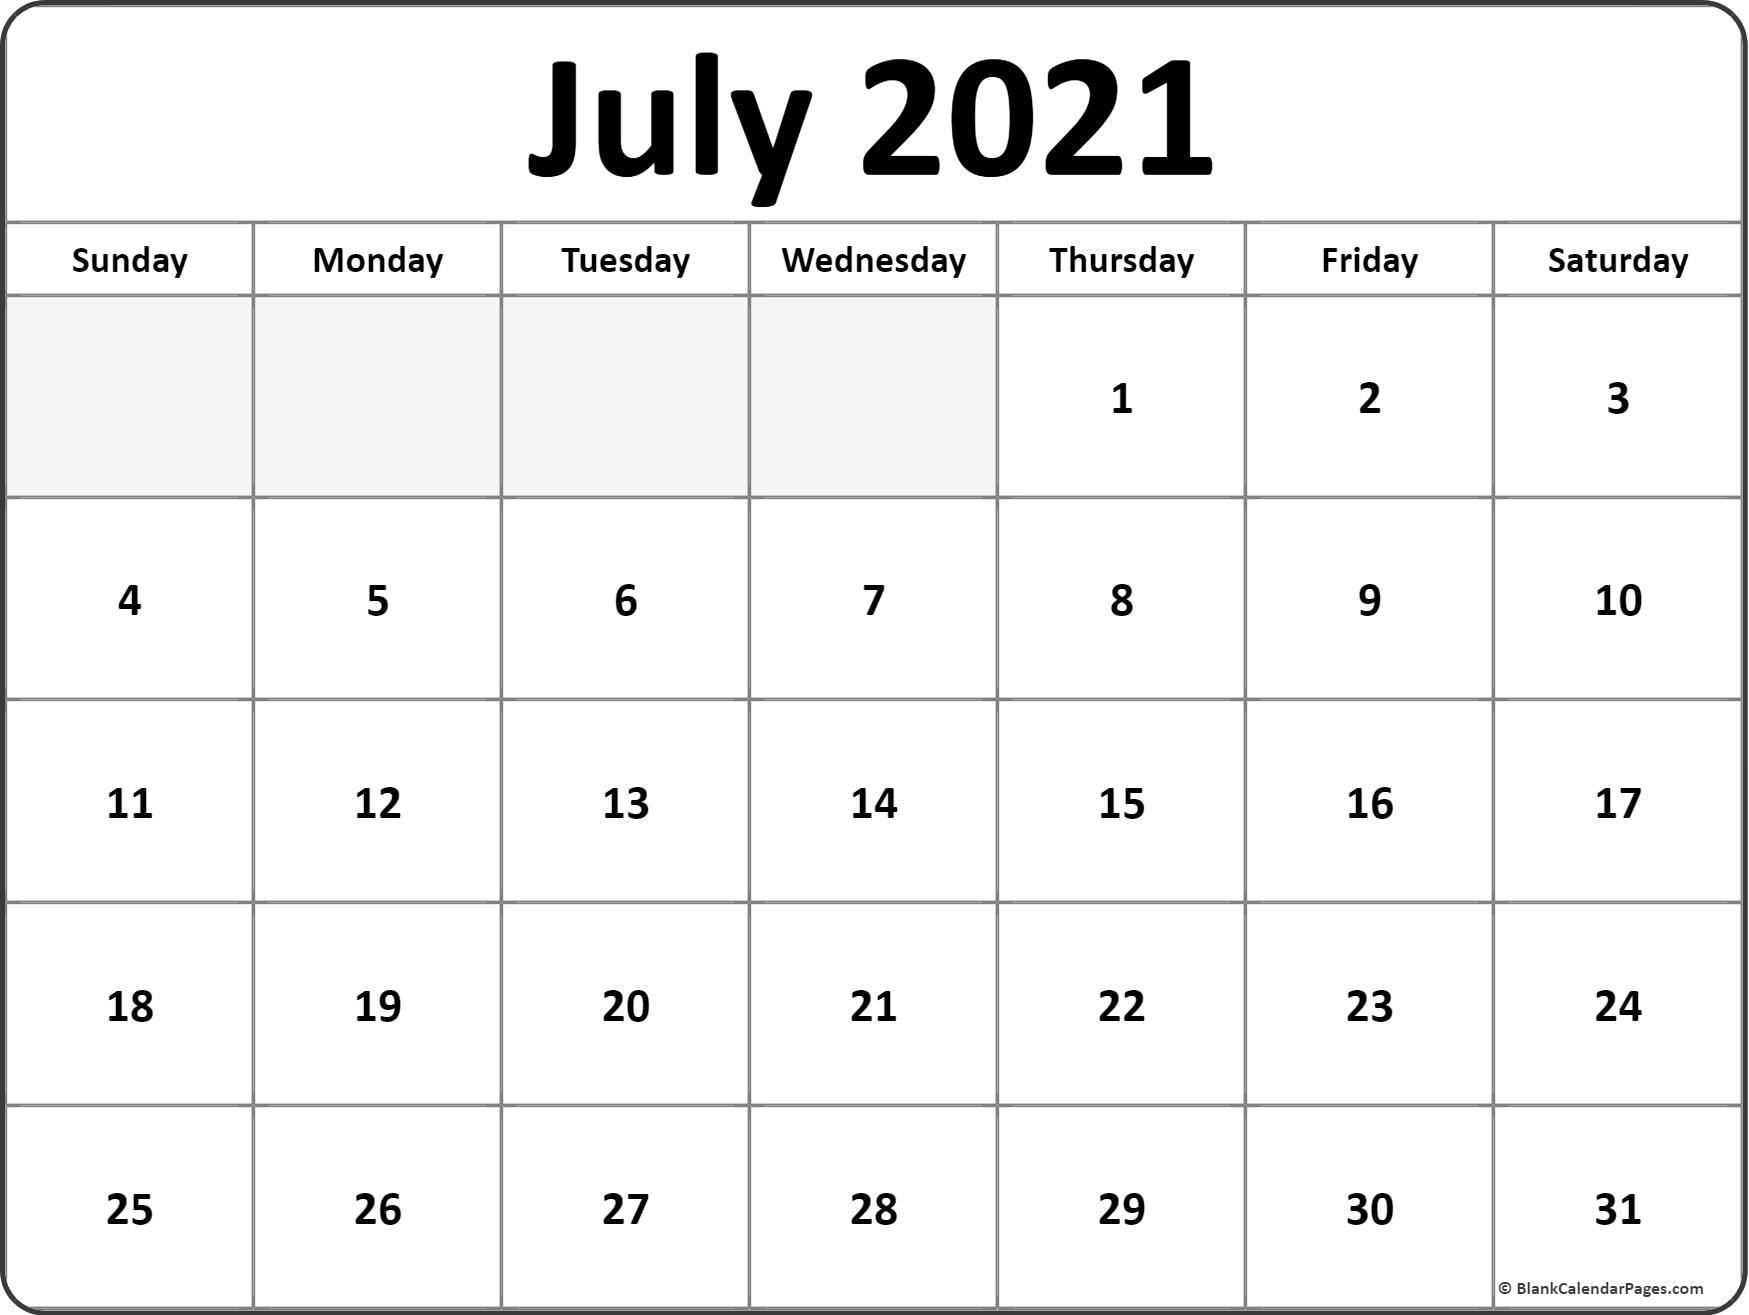 July 2021 Blank Calendar Templates